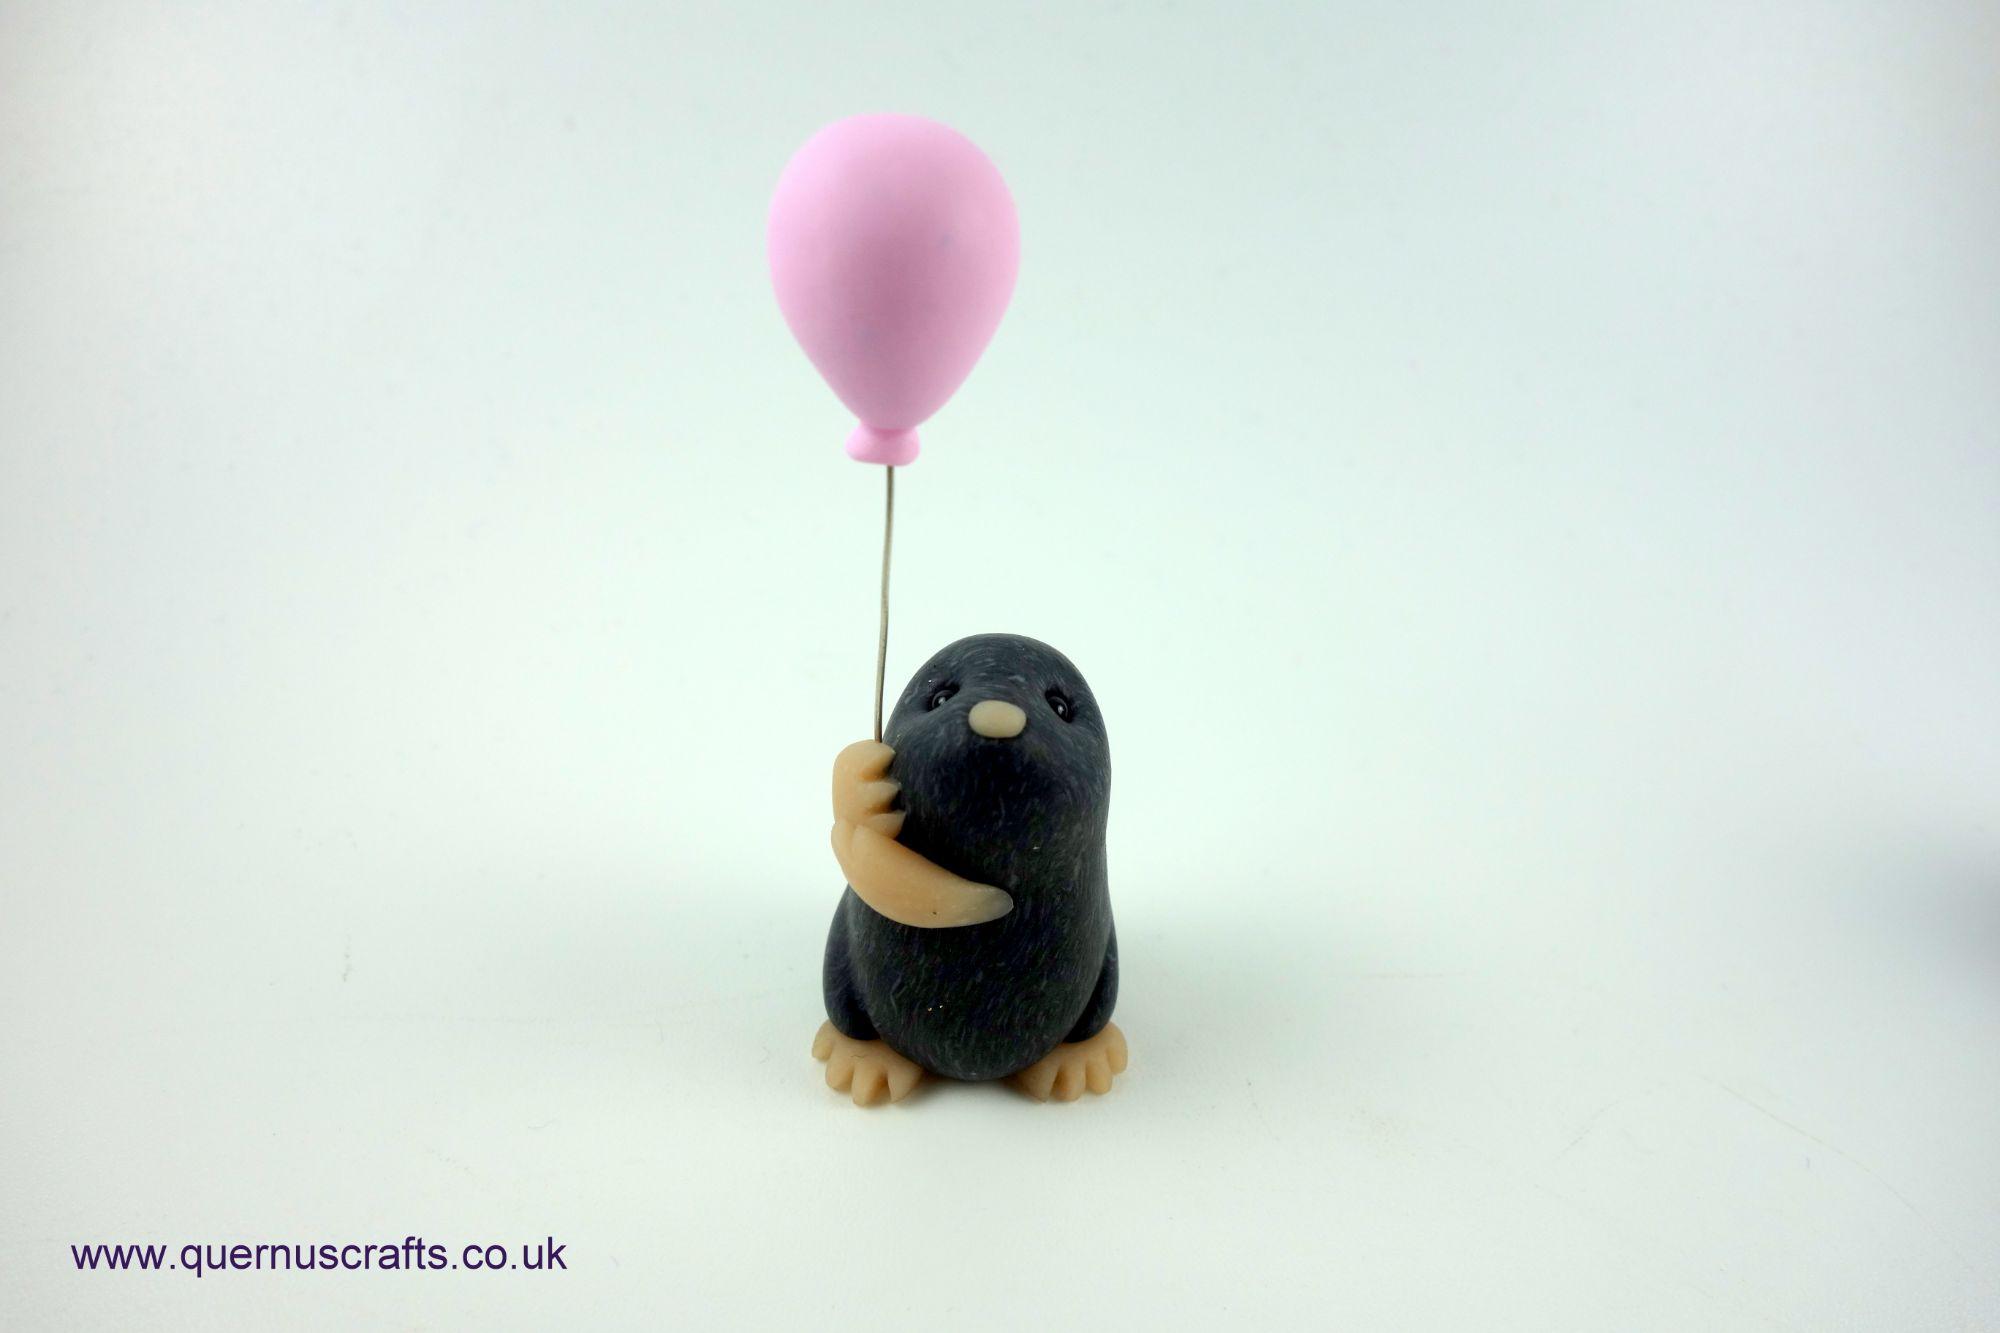 Wee Pink Balloon Mole